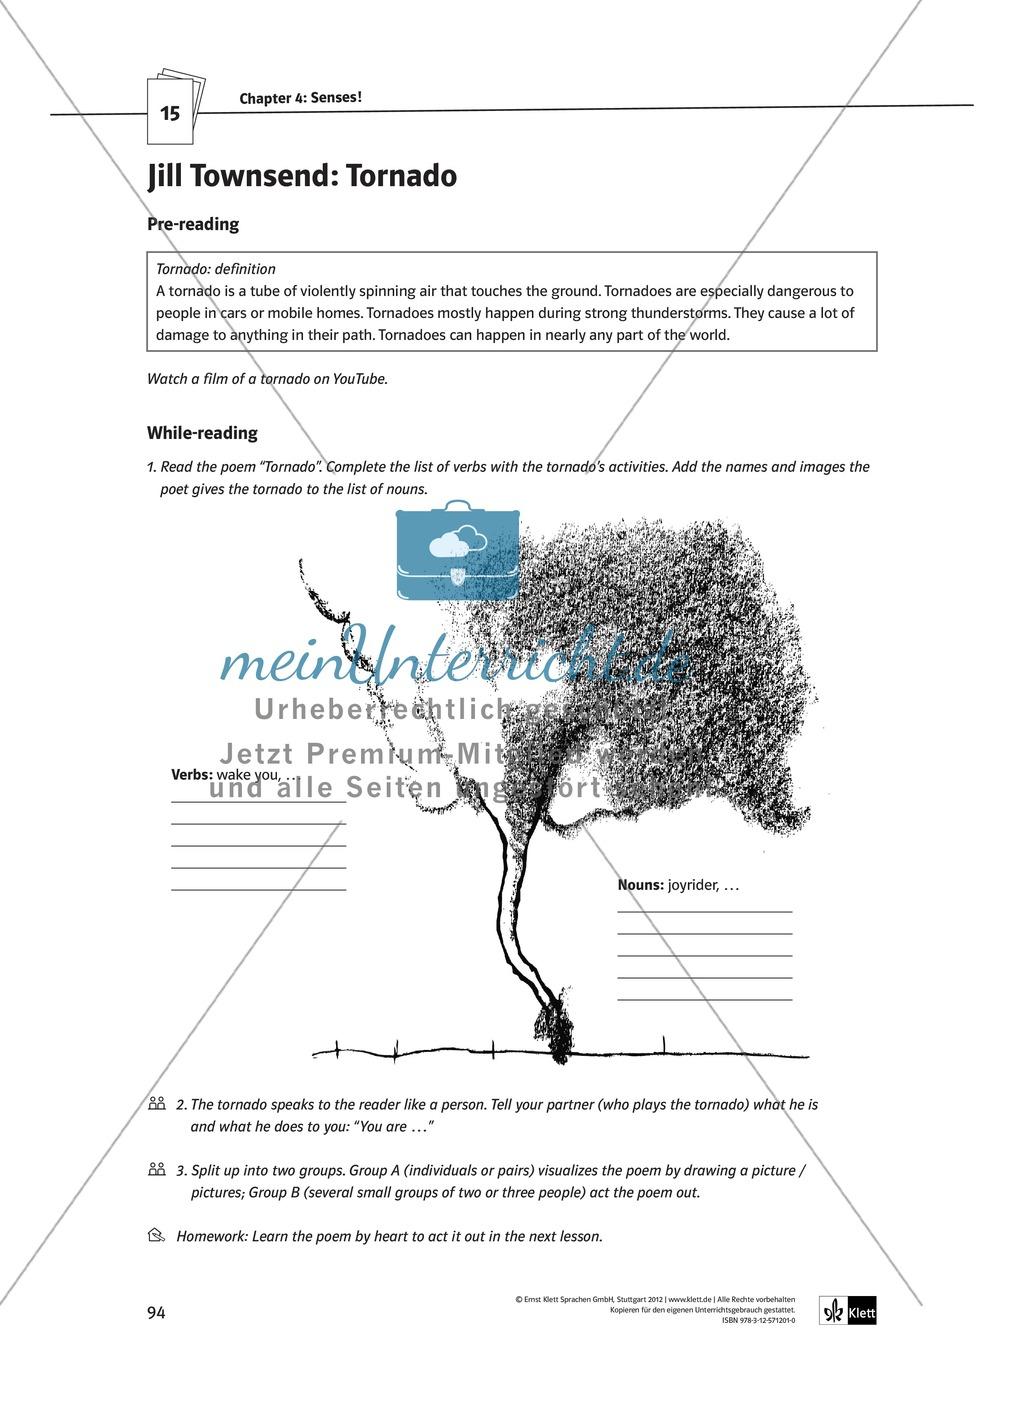 The Poetry Box: Wild Things? Beispiele + Lernziele + Verfahren + Arbeitsblätter Preview 22